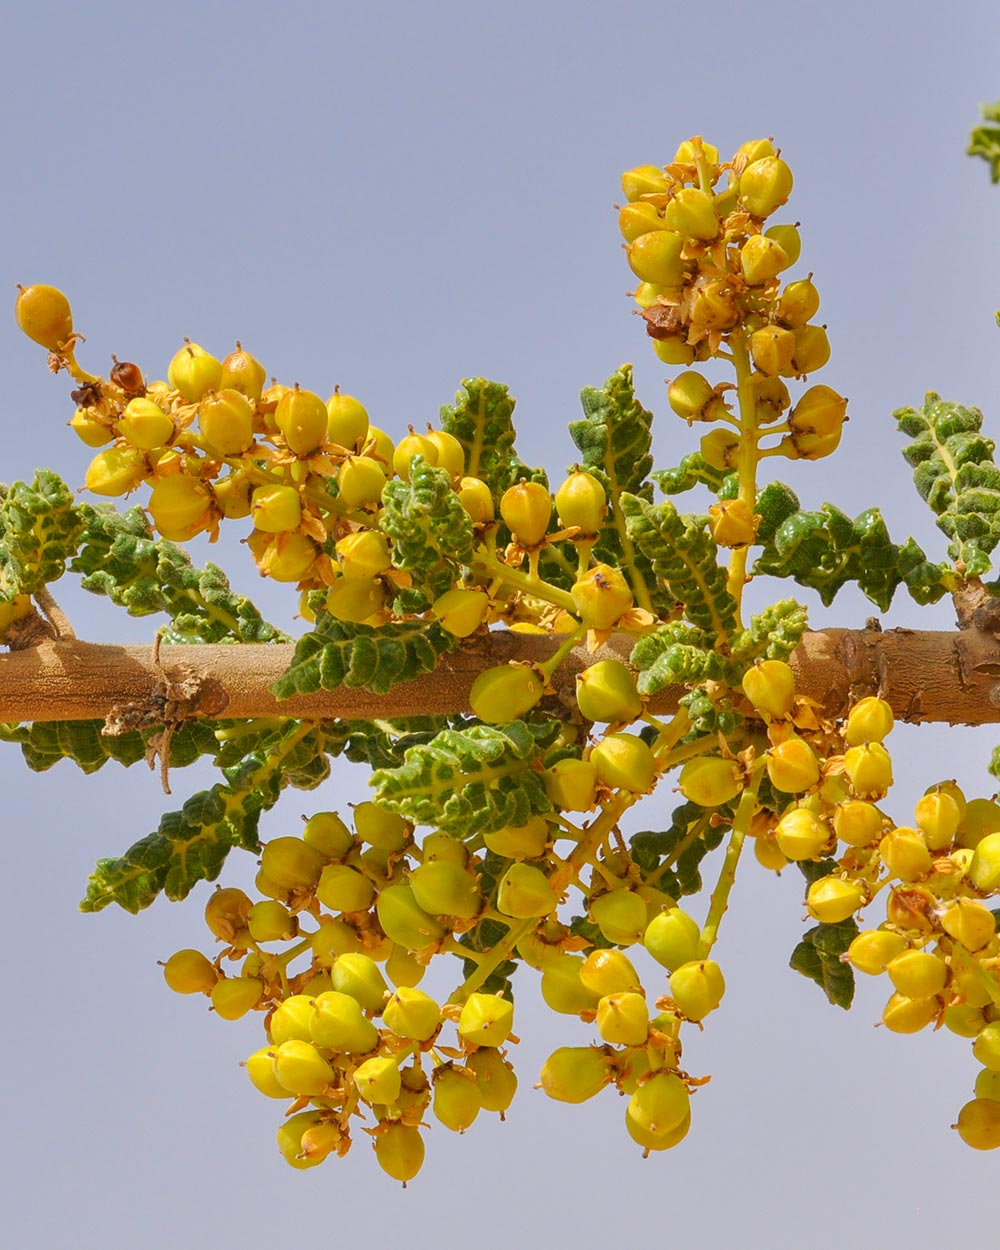 Seeds of Boswellia sacra